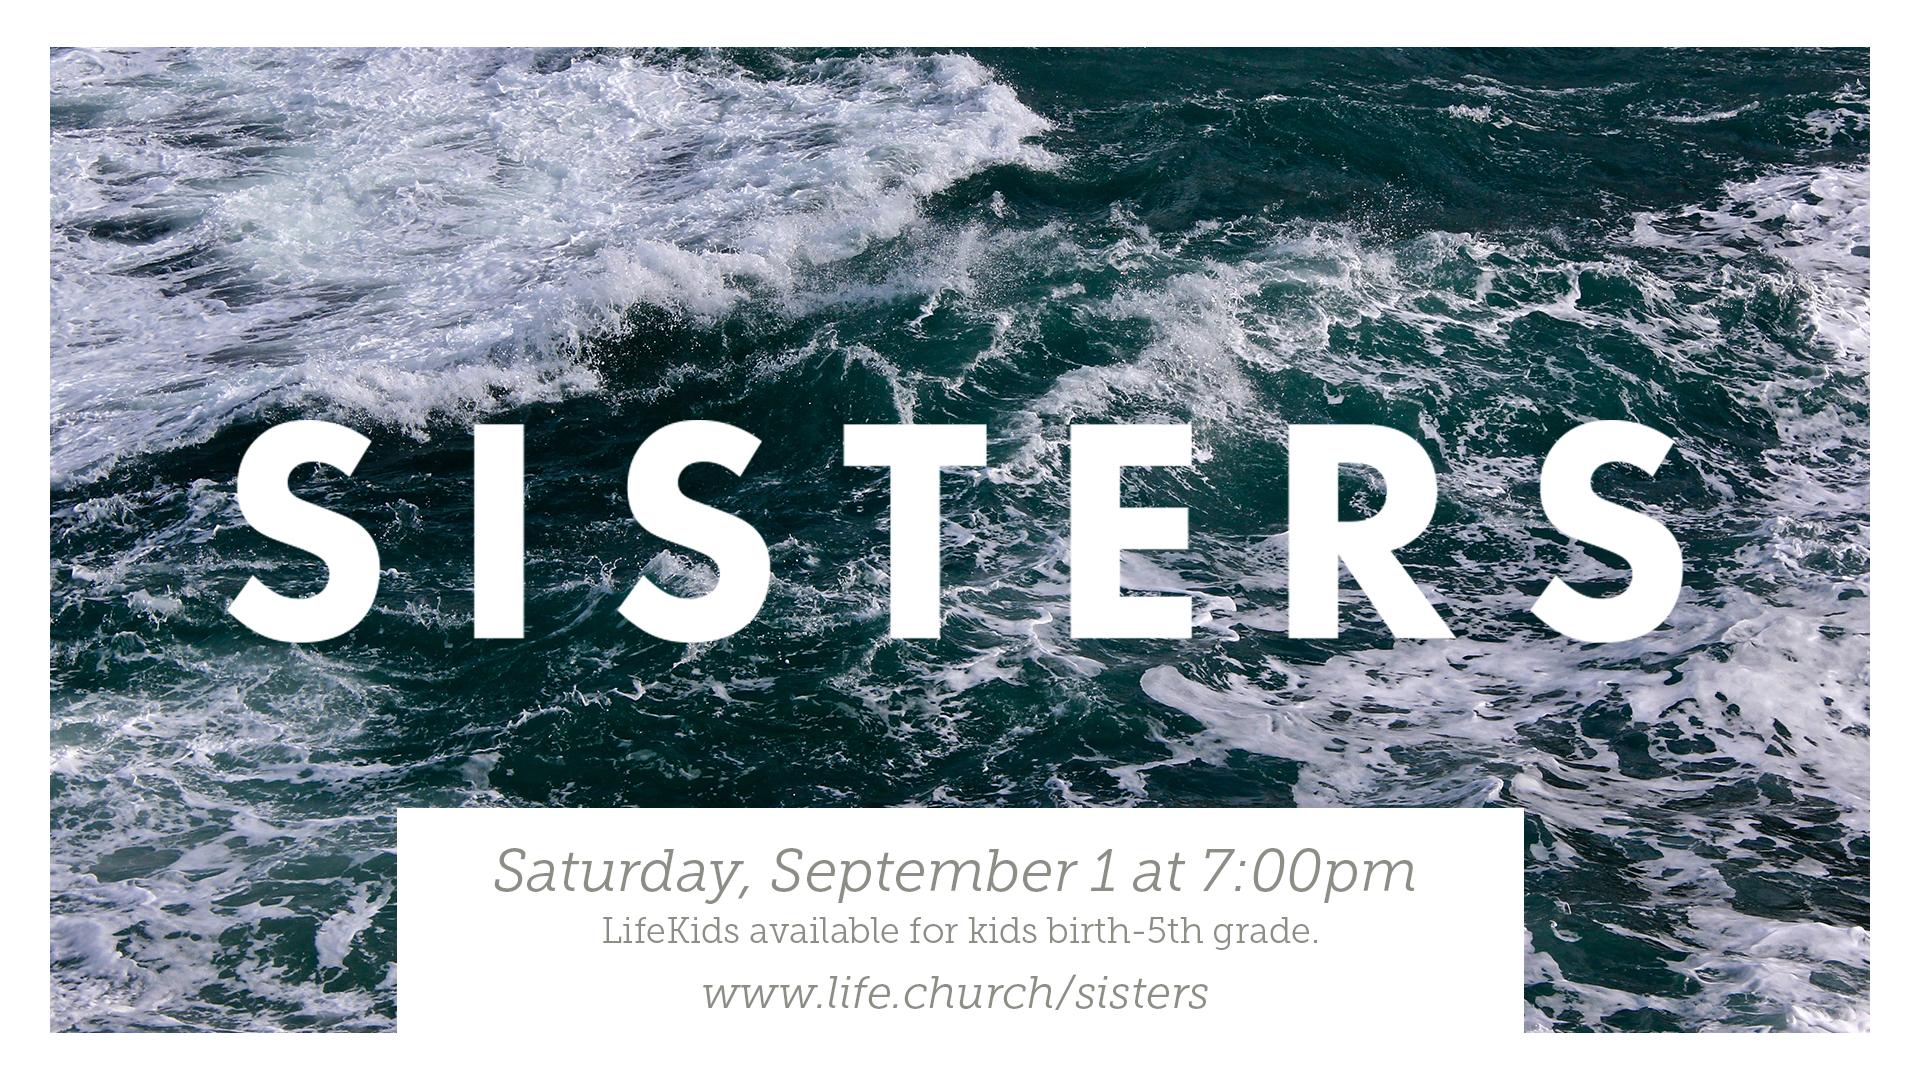 Sisters Event Slide - Editable .PSD